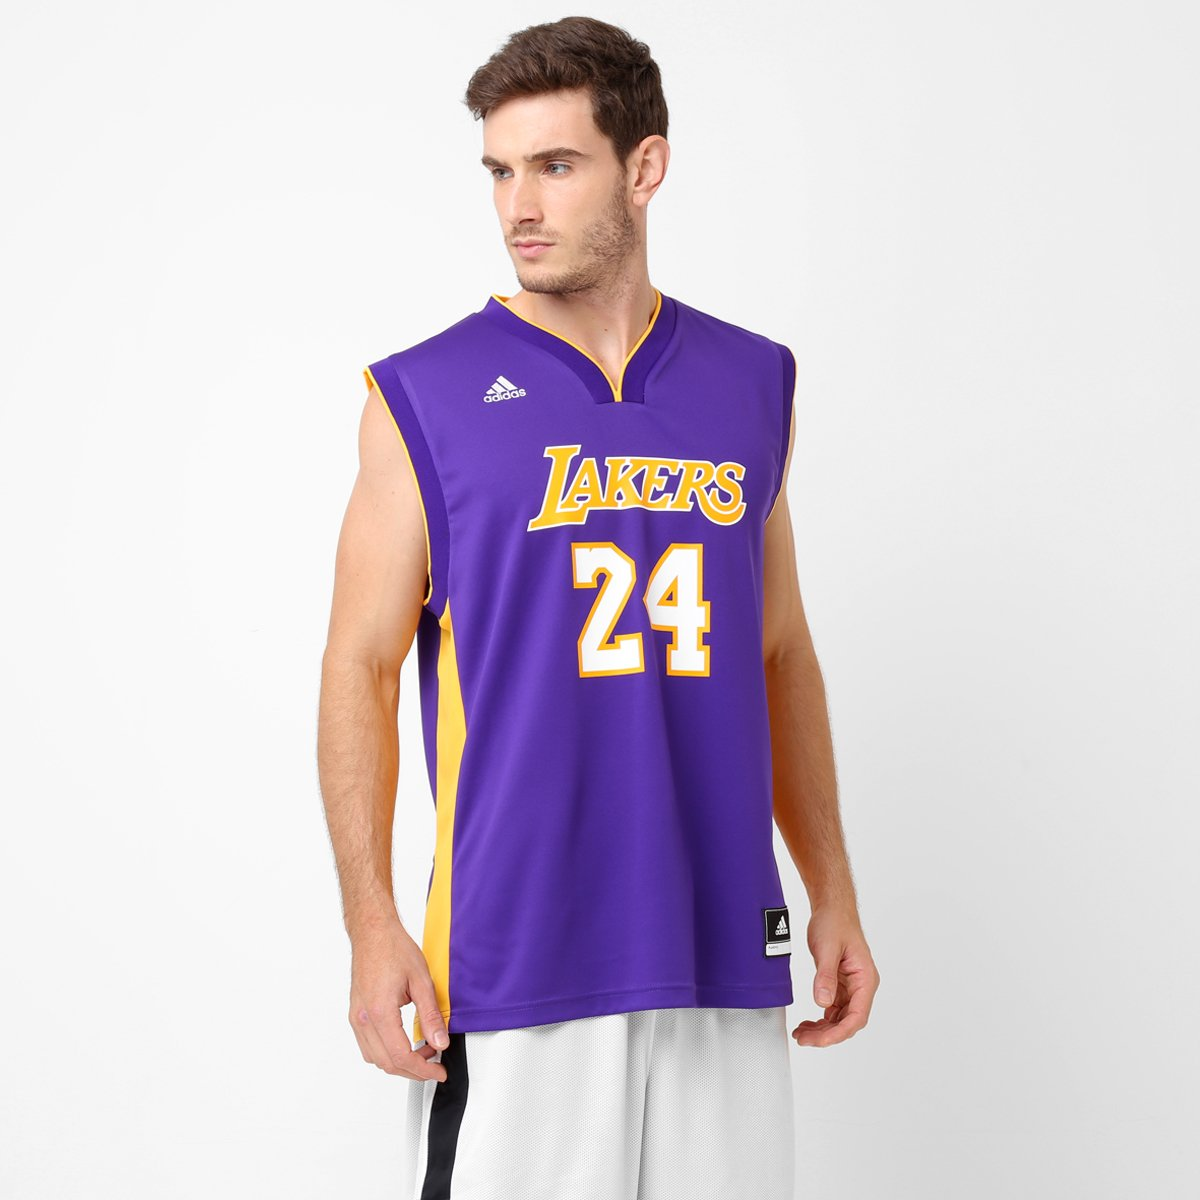 e3436607d Camiseta Regata NBA Adidas Los Angeles Lakers Road - Bryant - Compre Agora